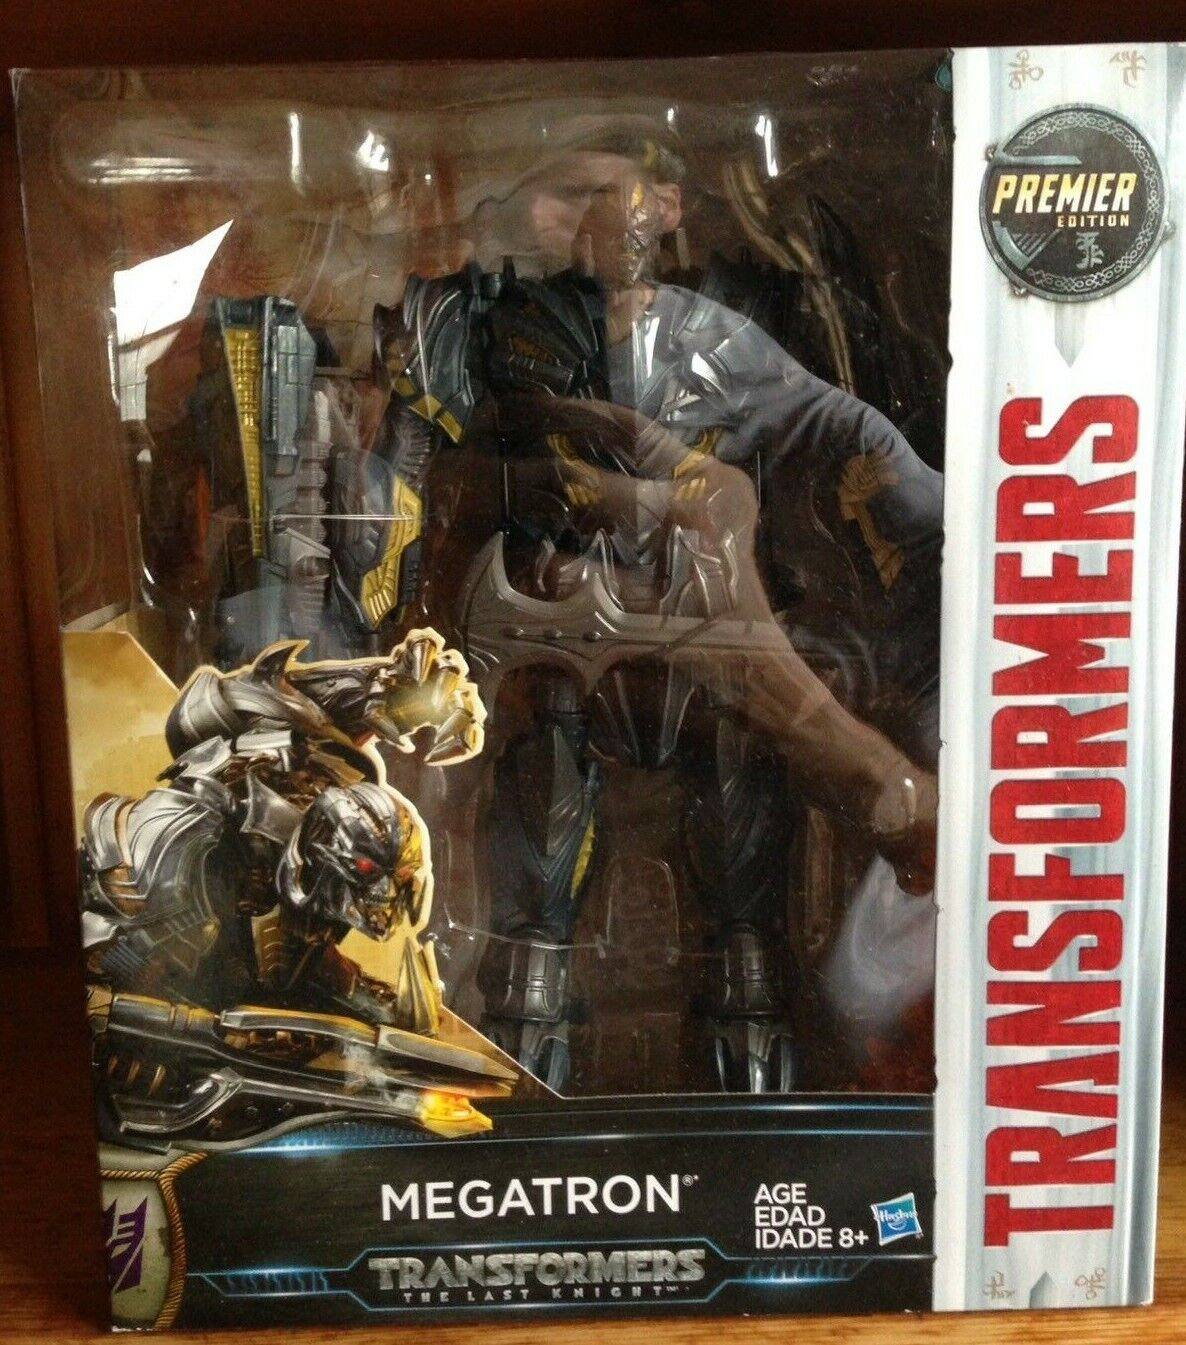 New Transformers The Last Knight TLK Premier Edition Leader Class Megatron MISB